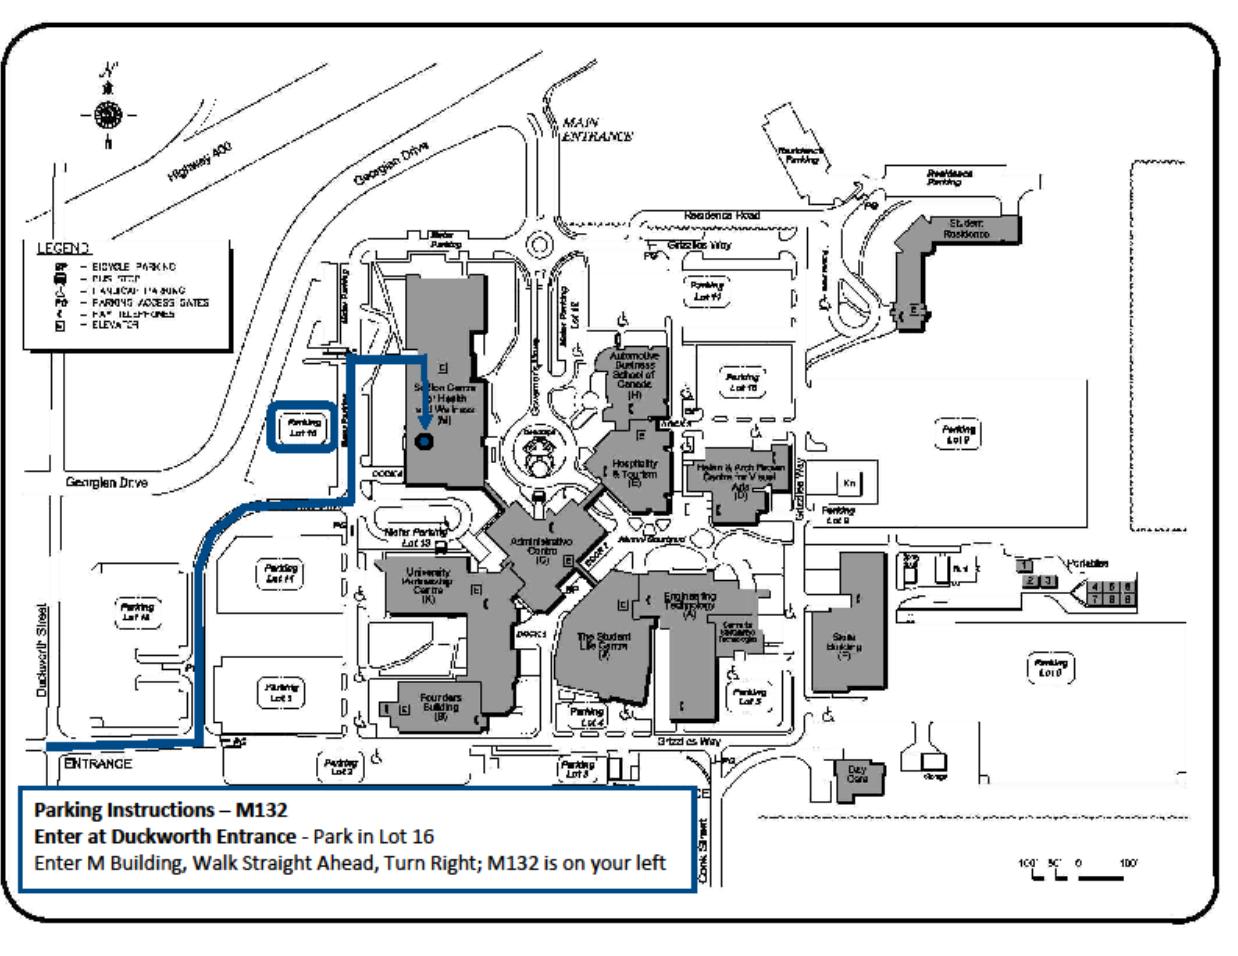 M132 Parking Map